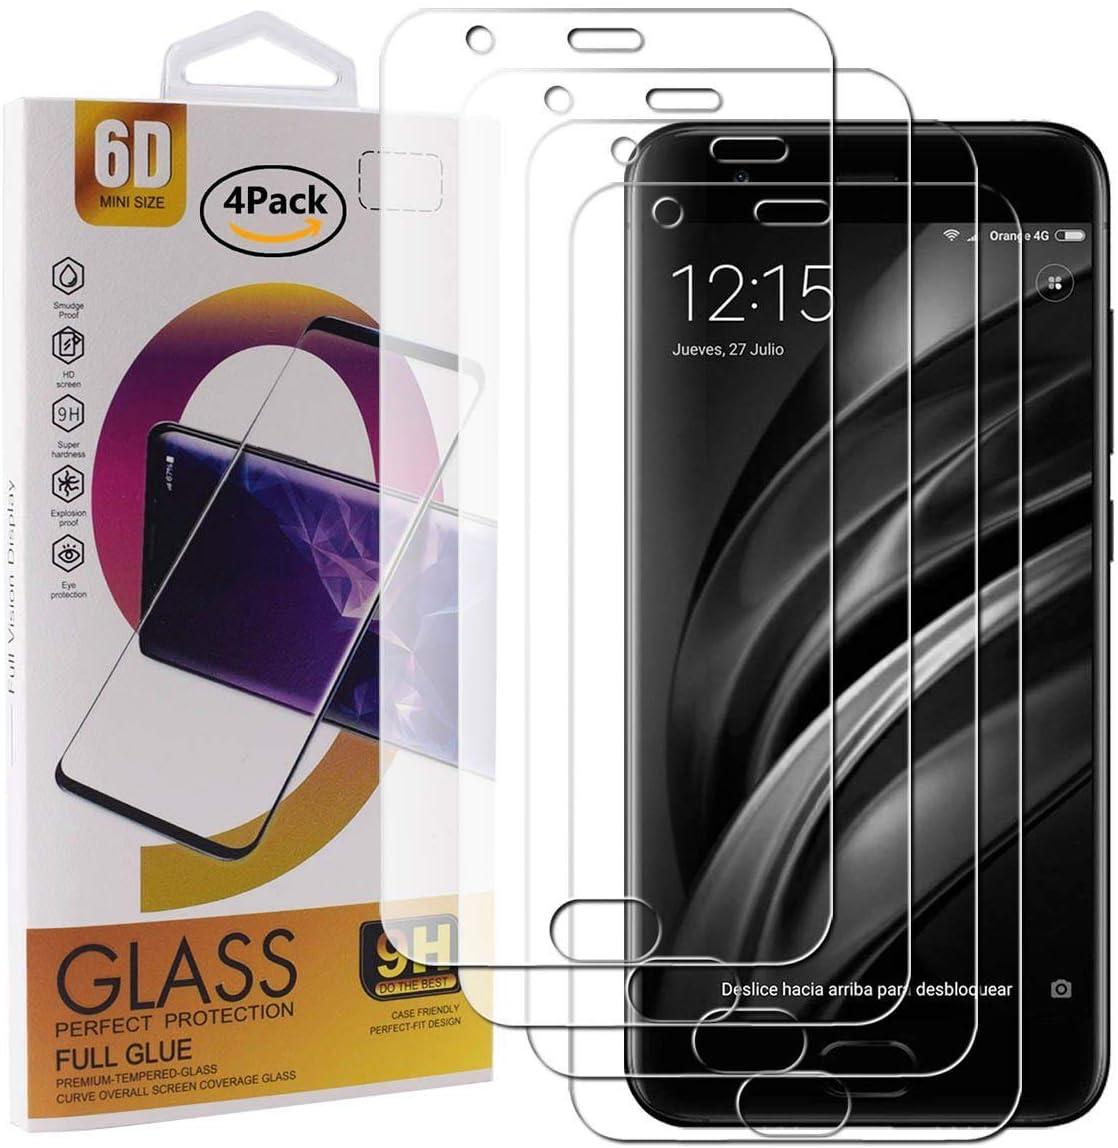 Guran 4 Paquete Cristal Templado Protector de Pantalla para Xiaomi Mi 6 Smartphone 9H Dureza Anti-Ara?azos Alta Definicion Transparente Película